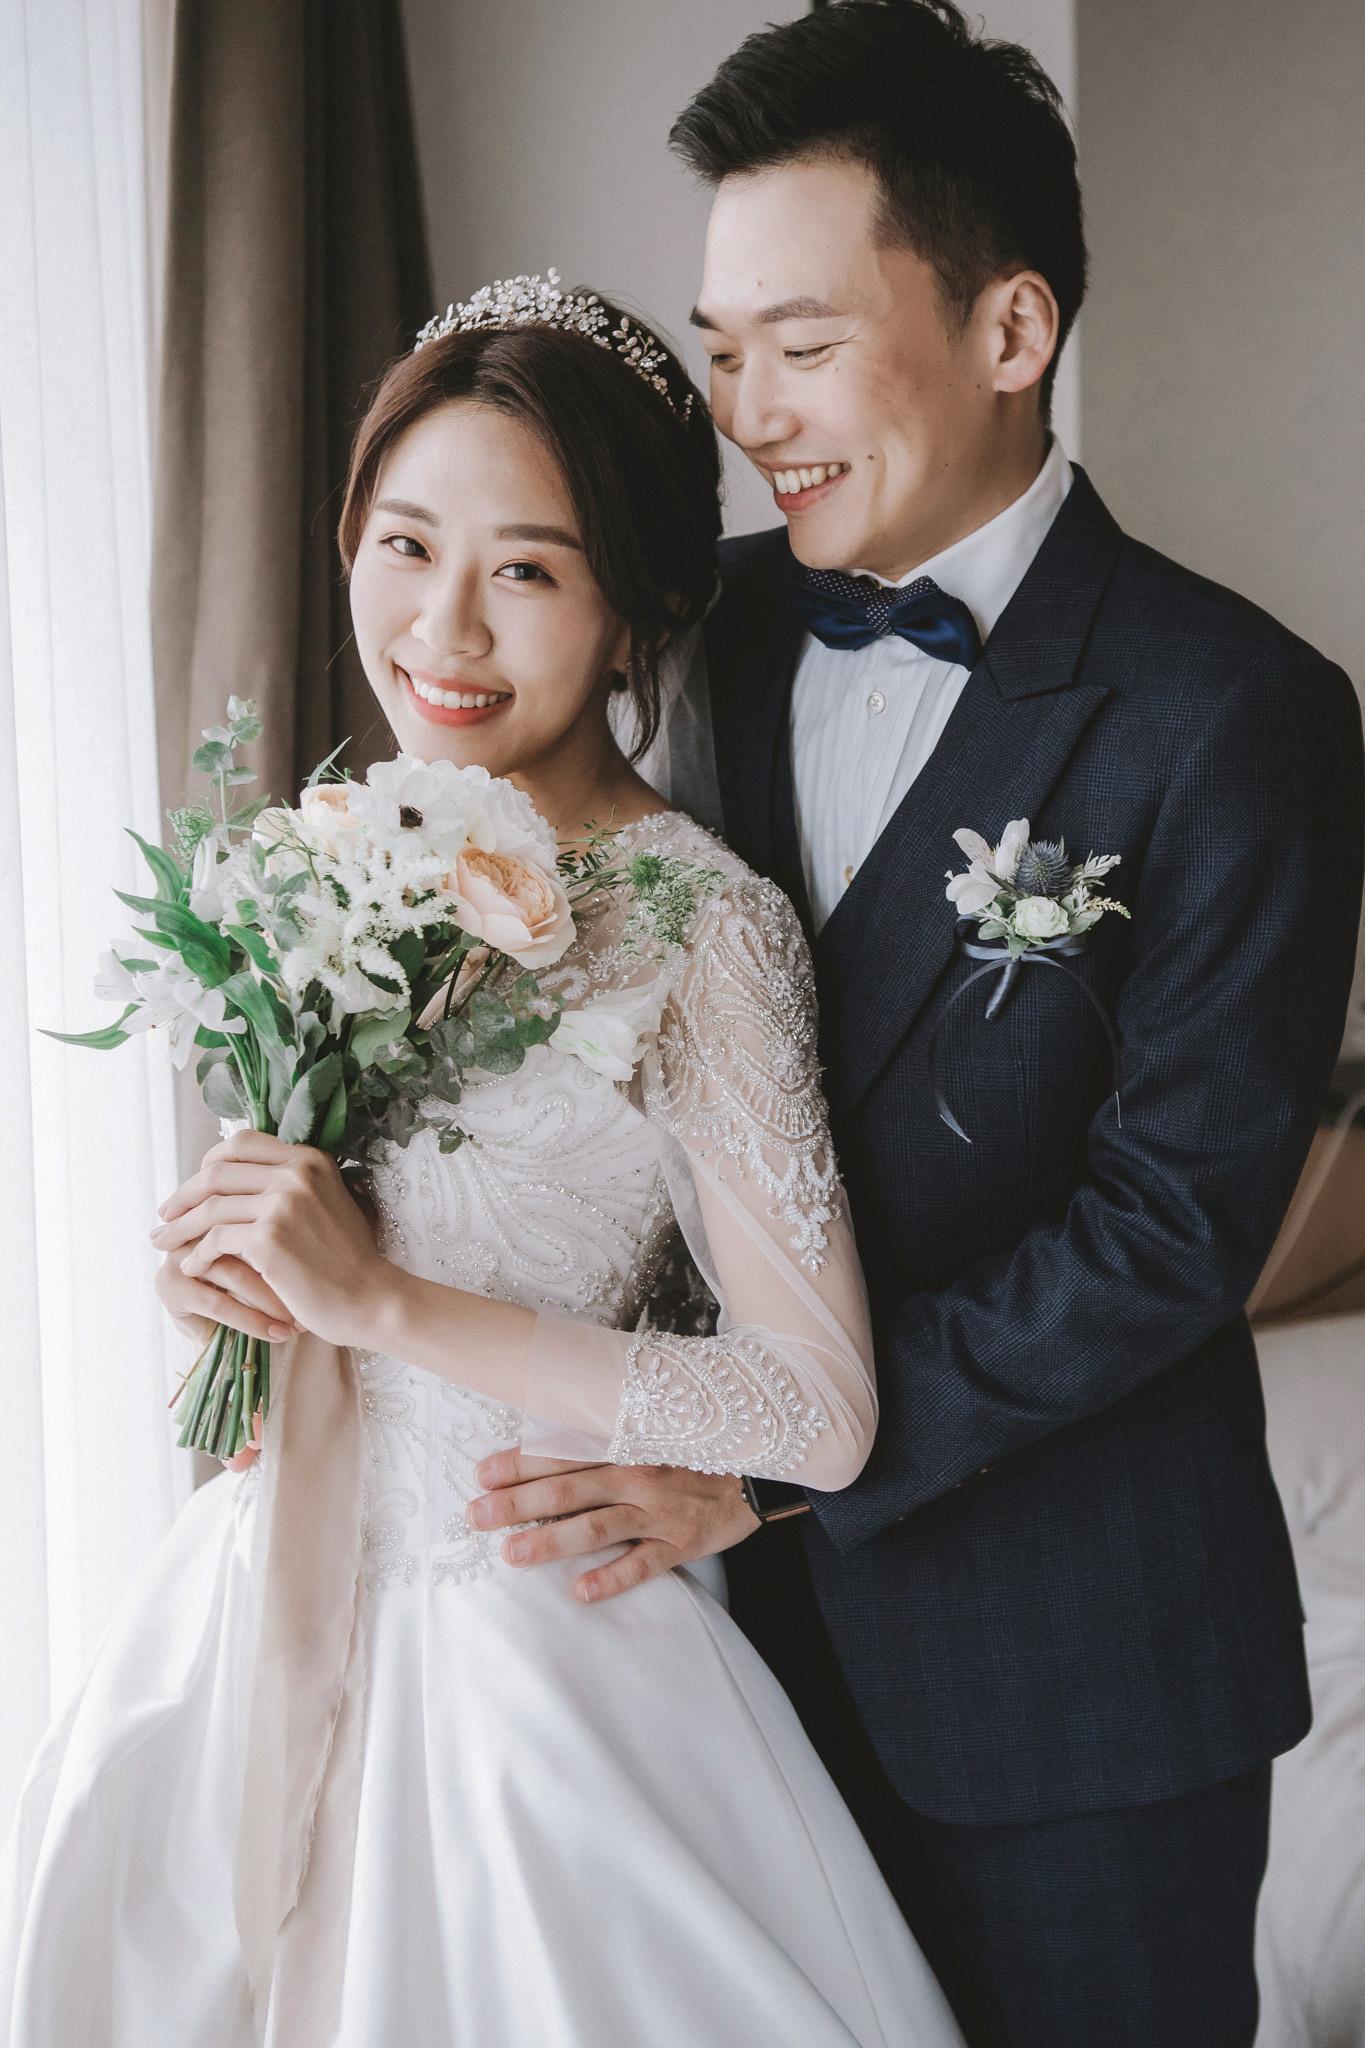 EW 居米 台北禮服 台北婚紗 台北婚攝 凱達飯店 台北婚禮